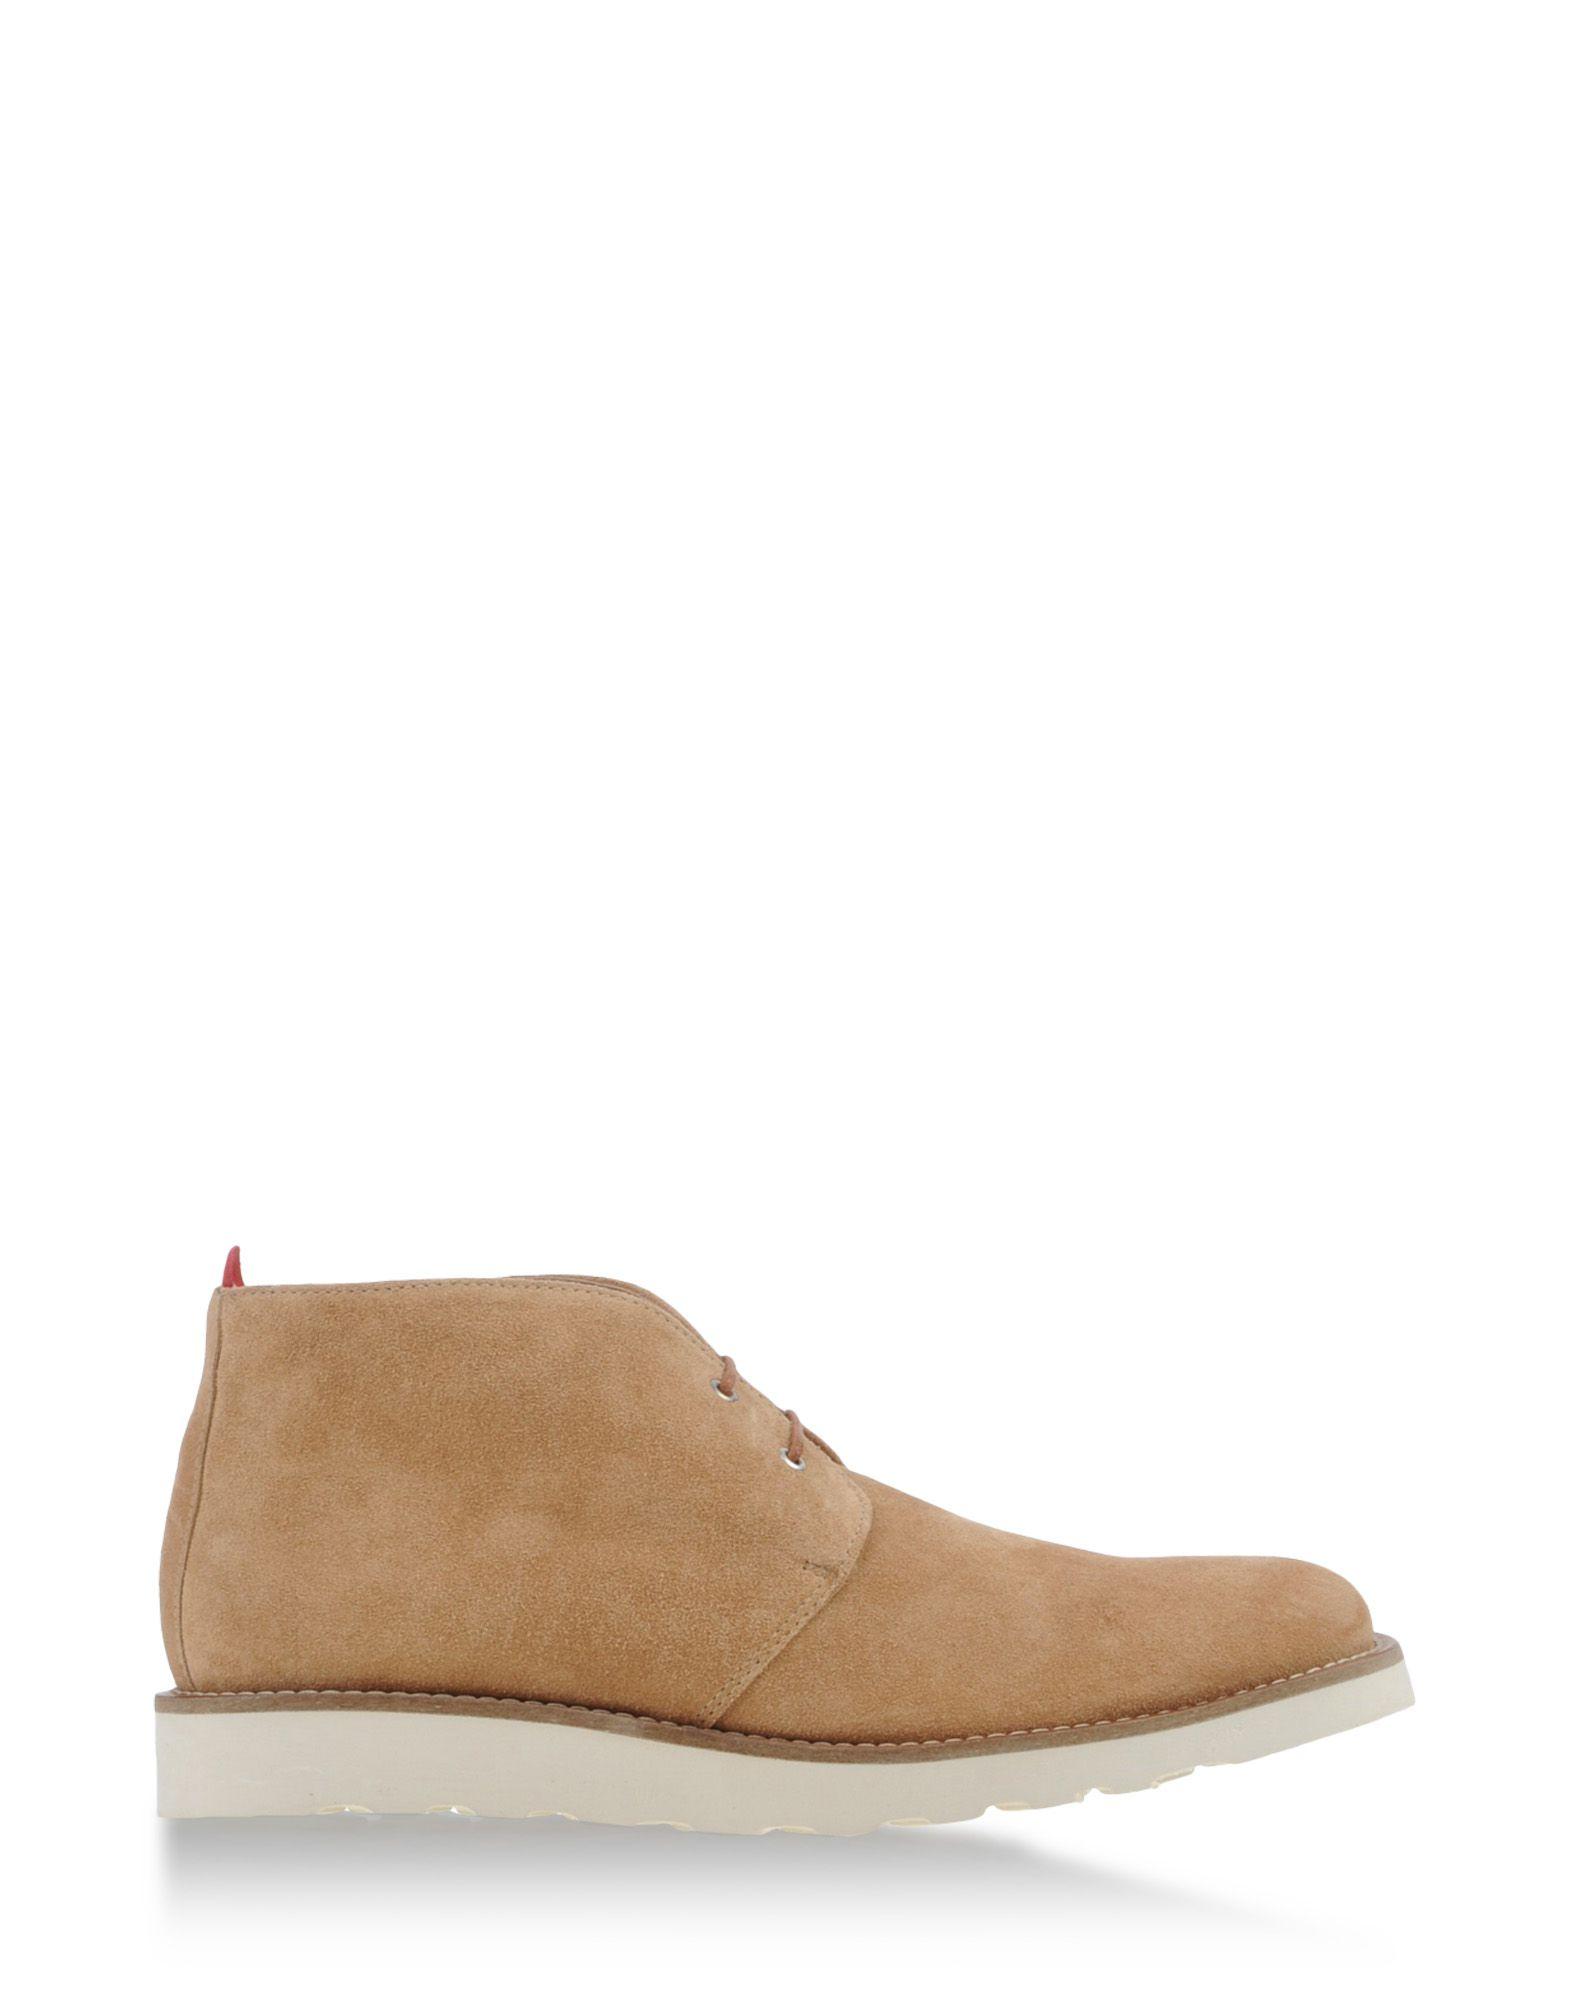 oliver spencer high top dress shoes in beige for